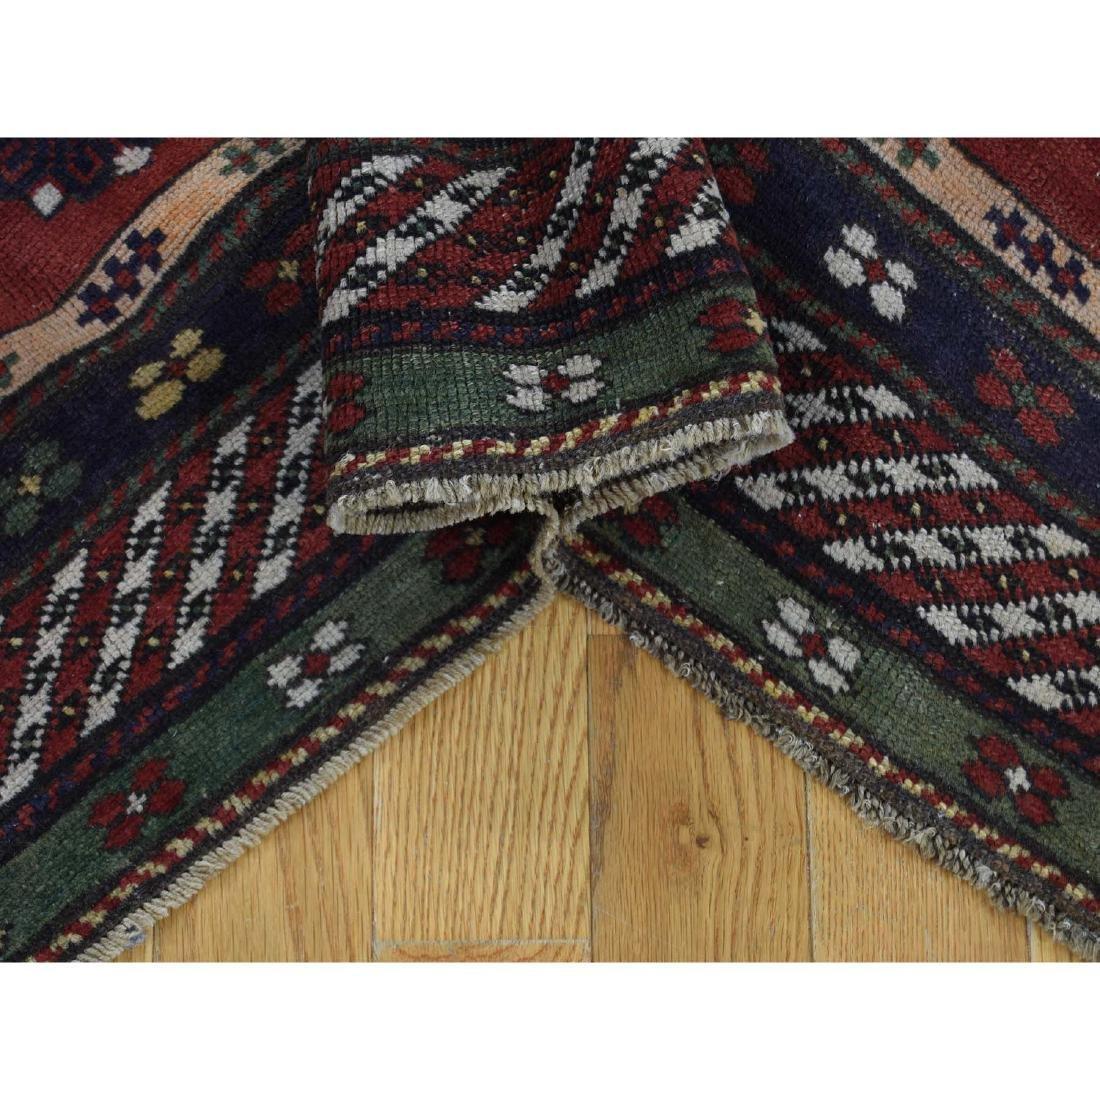 Antique Caucasian Kazak Good Condition Hand Knotted Rug - 6